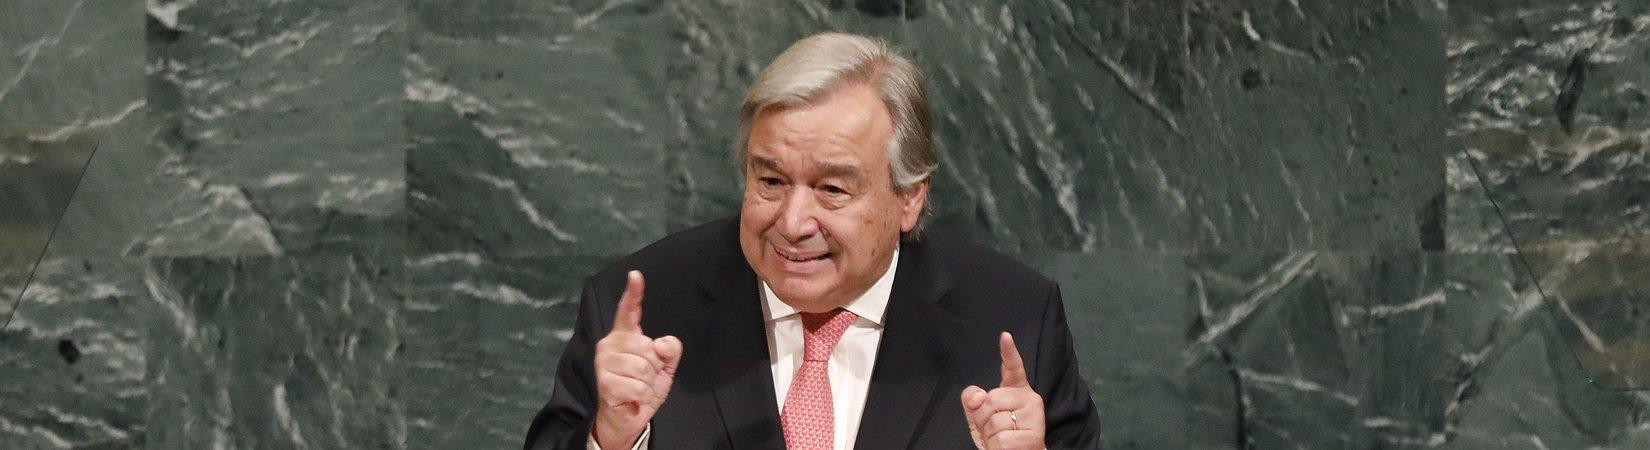 António Guterres aborda crise em Myanmar